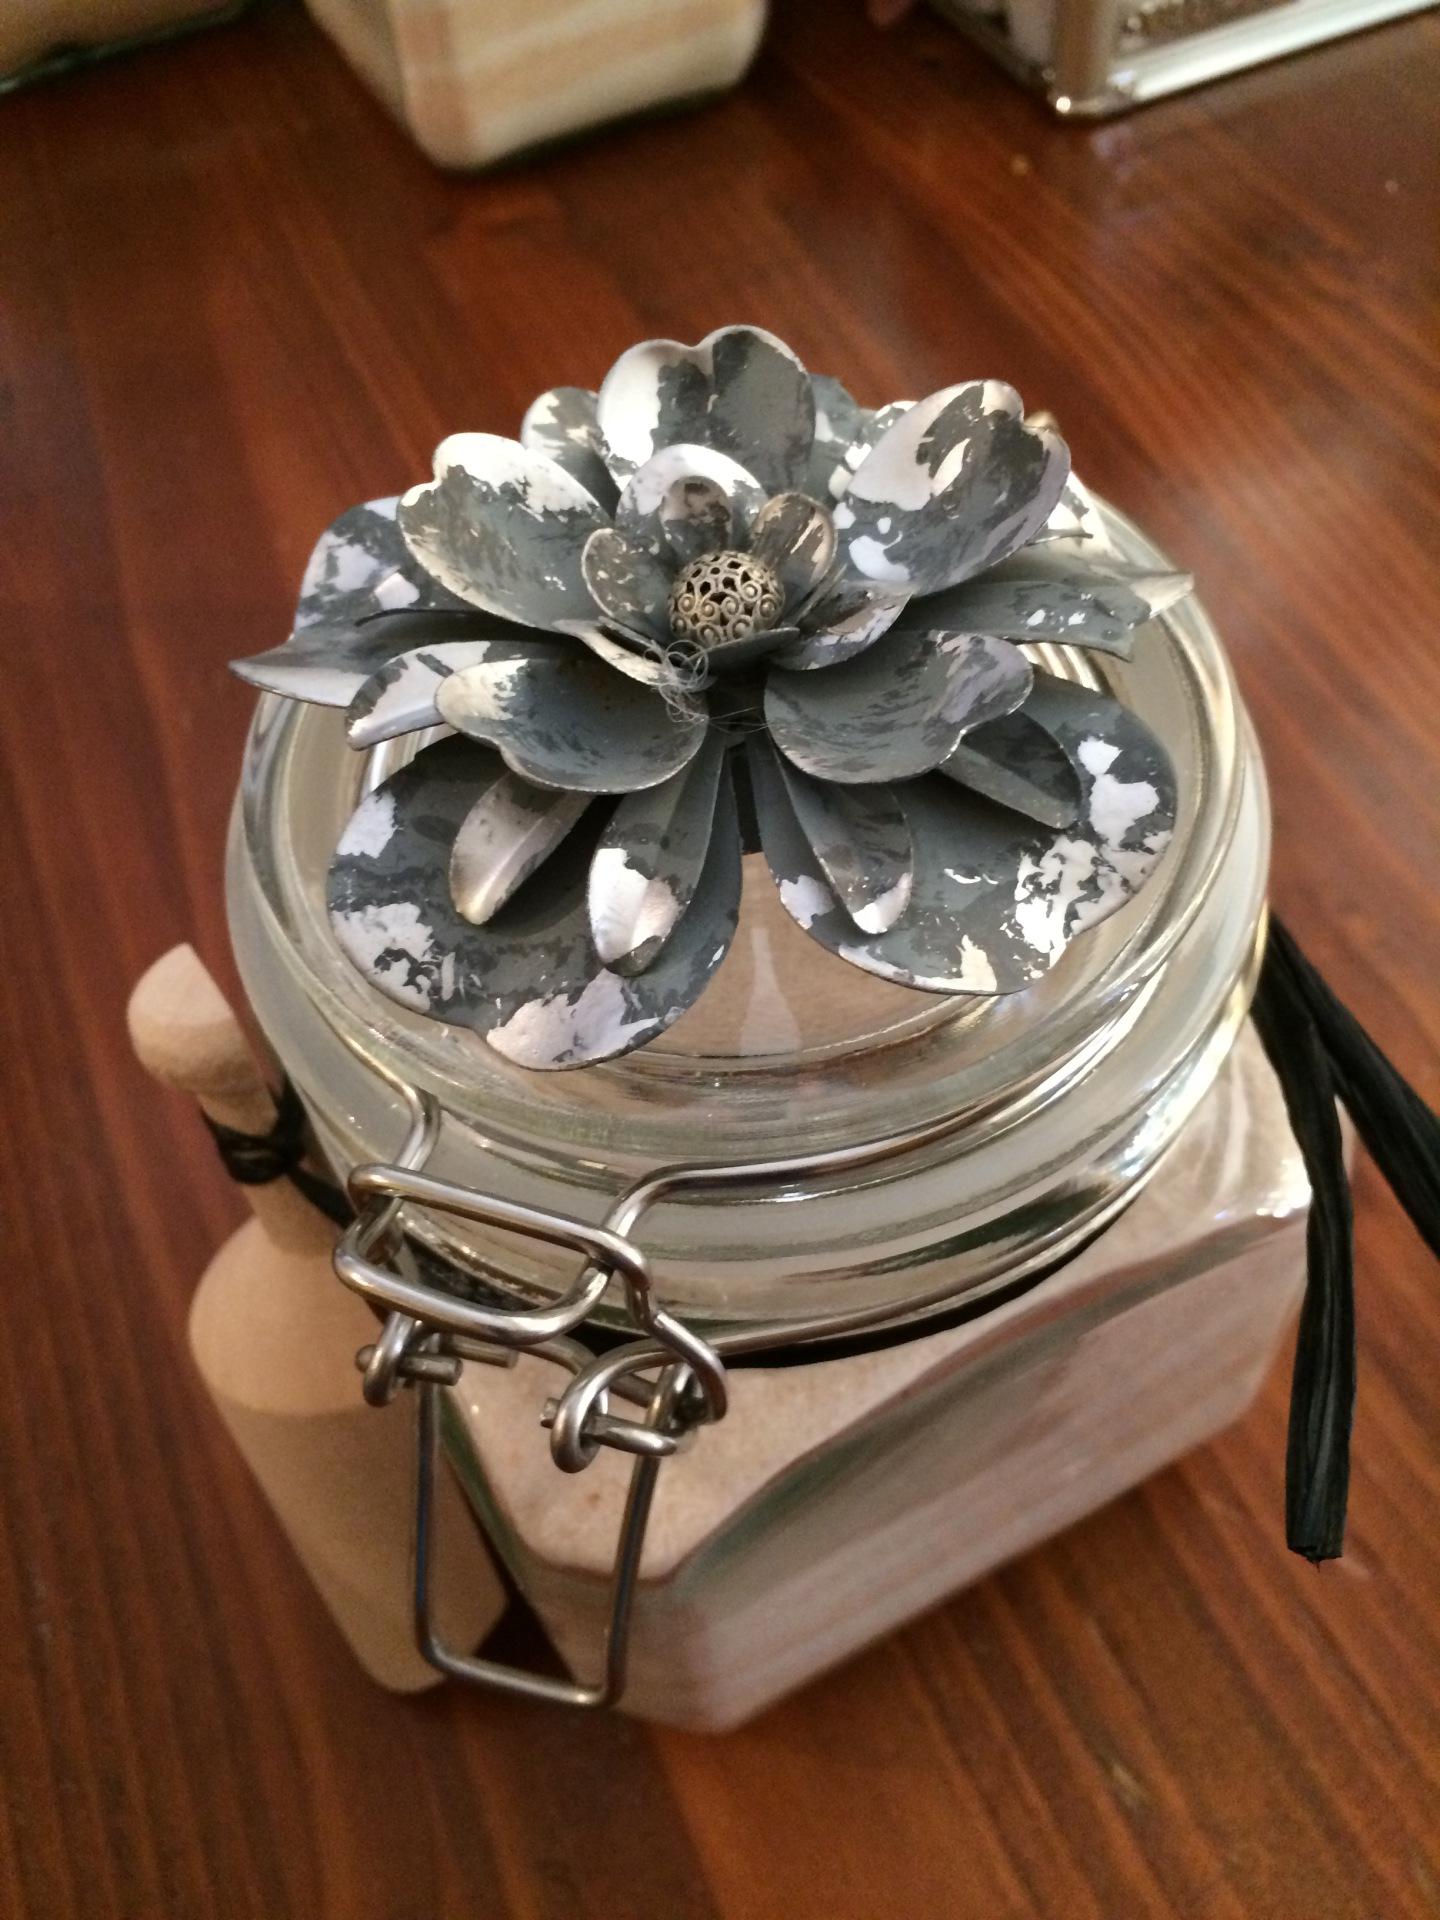 4 Cups Decorative jar Bath Salts  $45.00